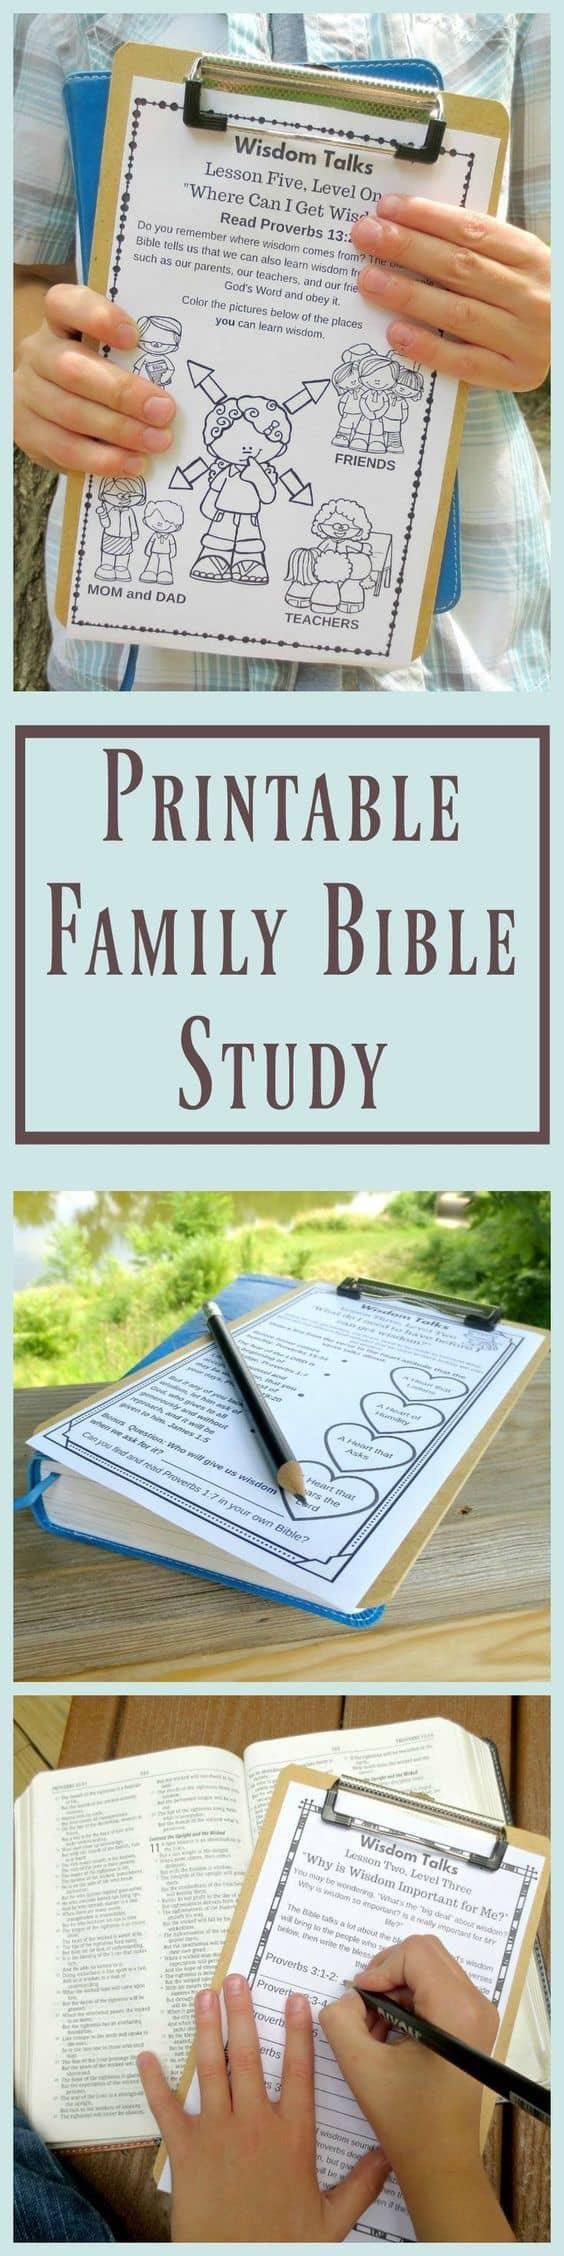 familybiblestudy